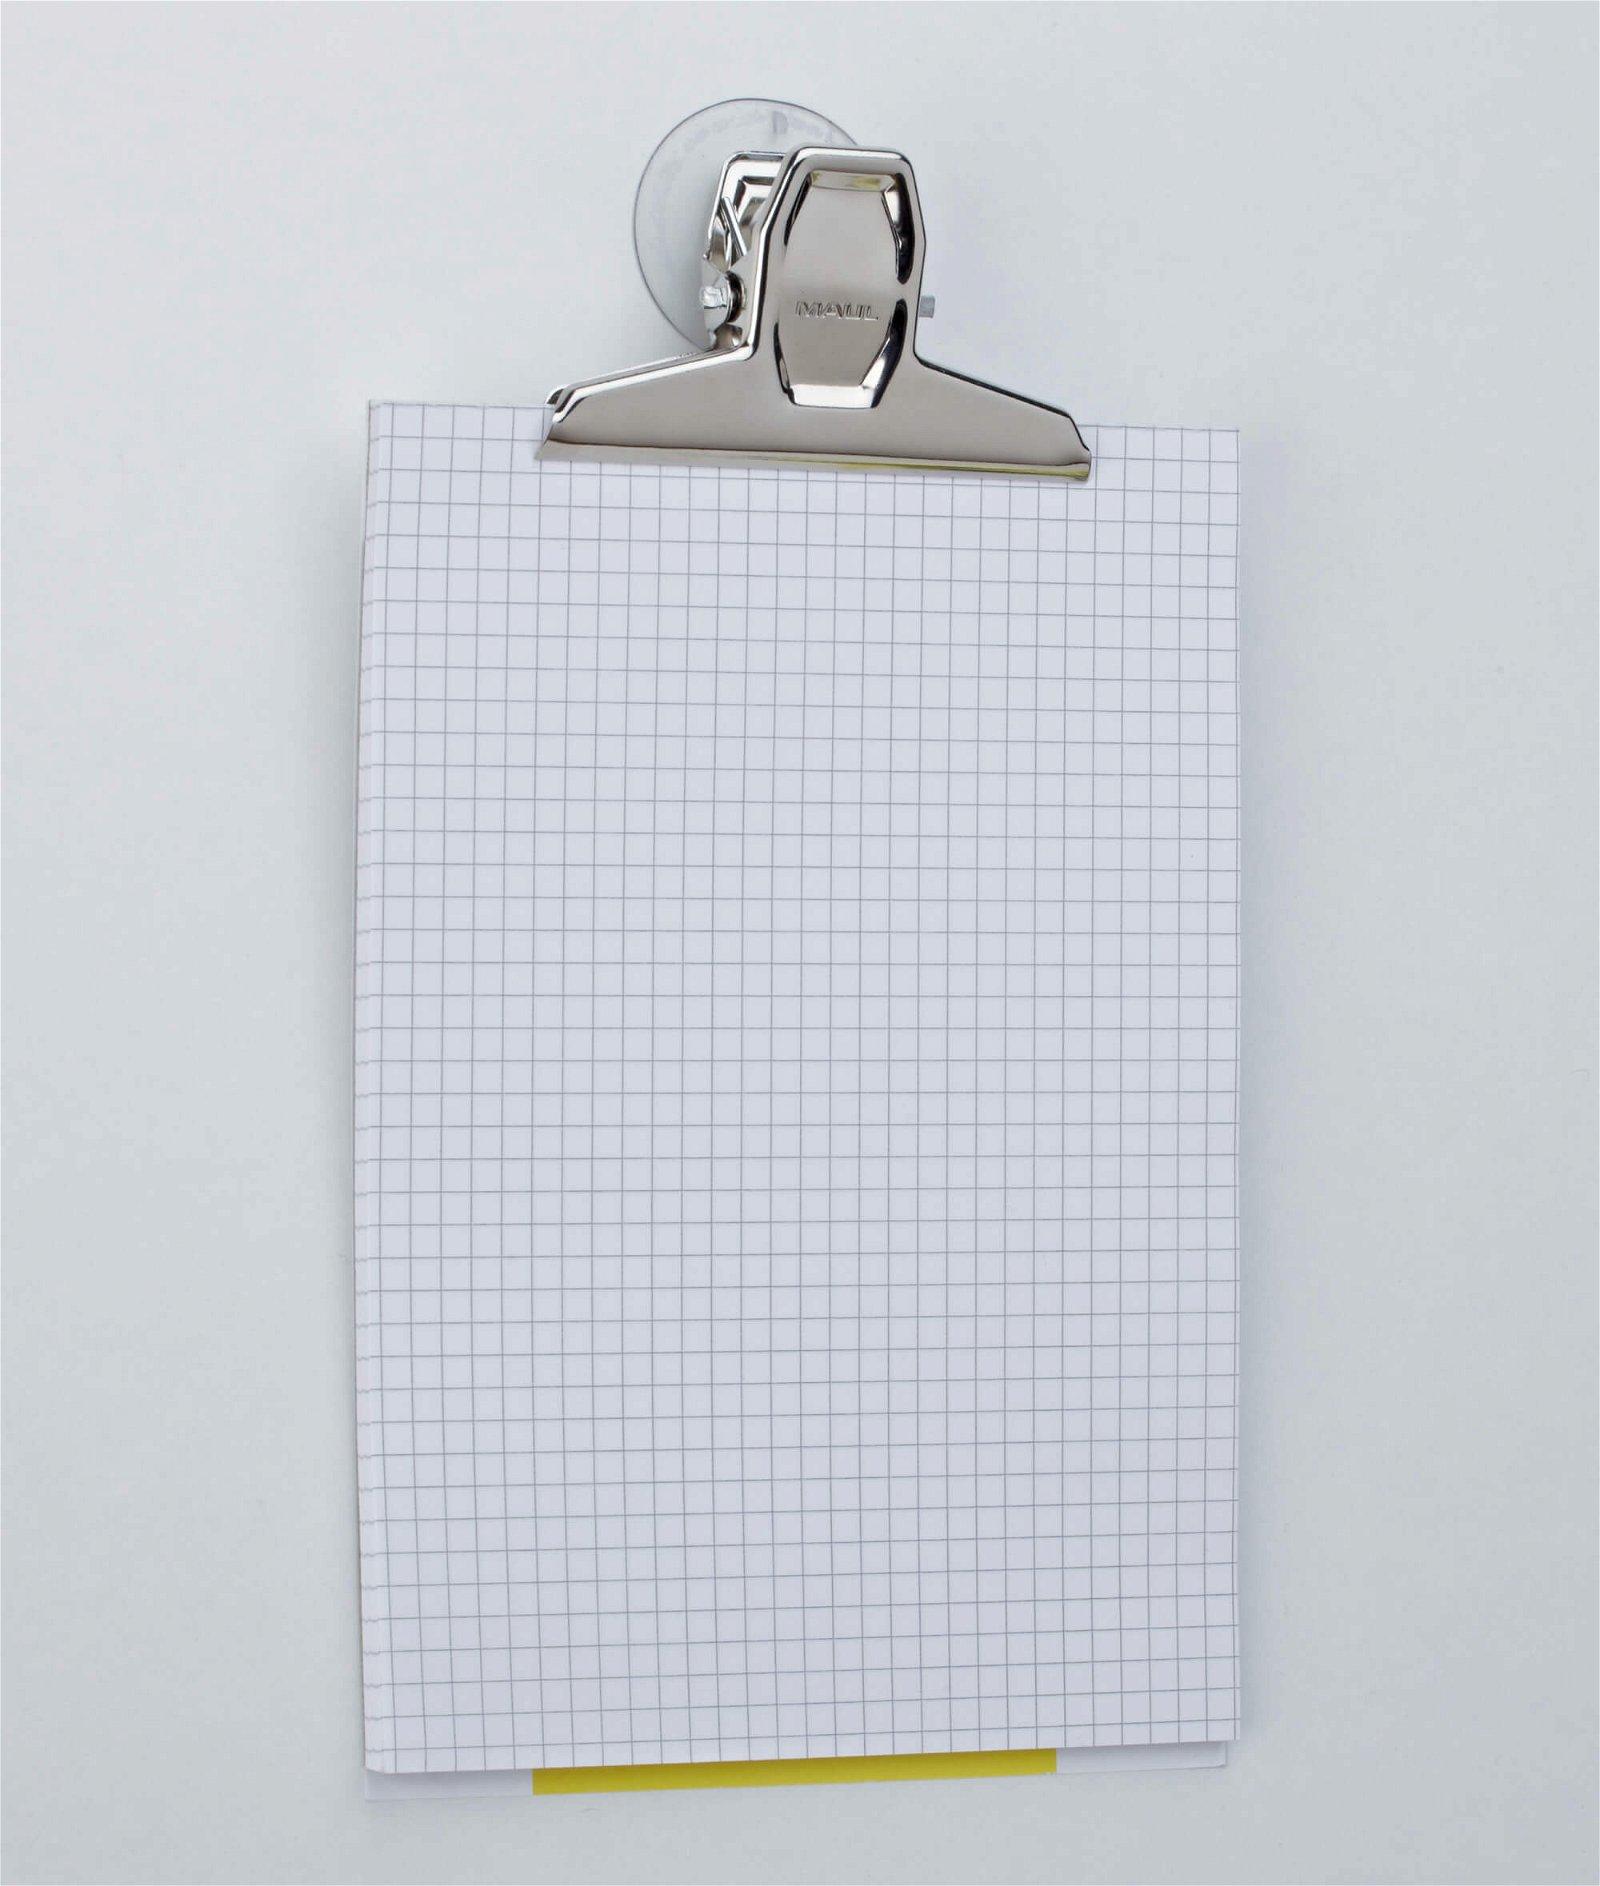 Papier-Klemmer MAULpro mit Saugnapf